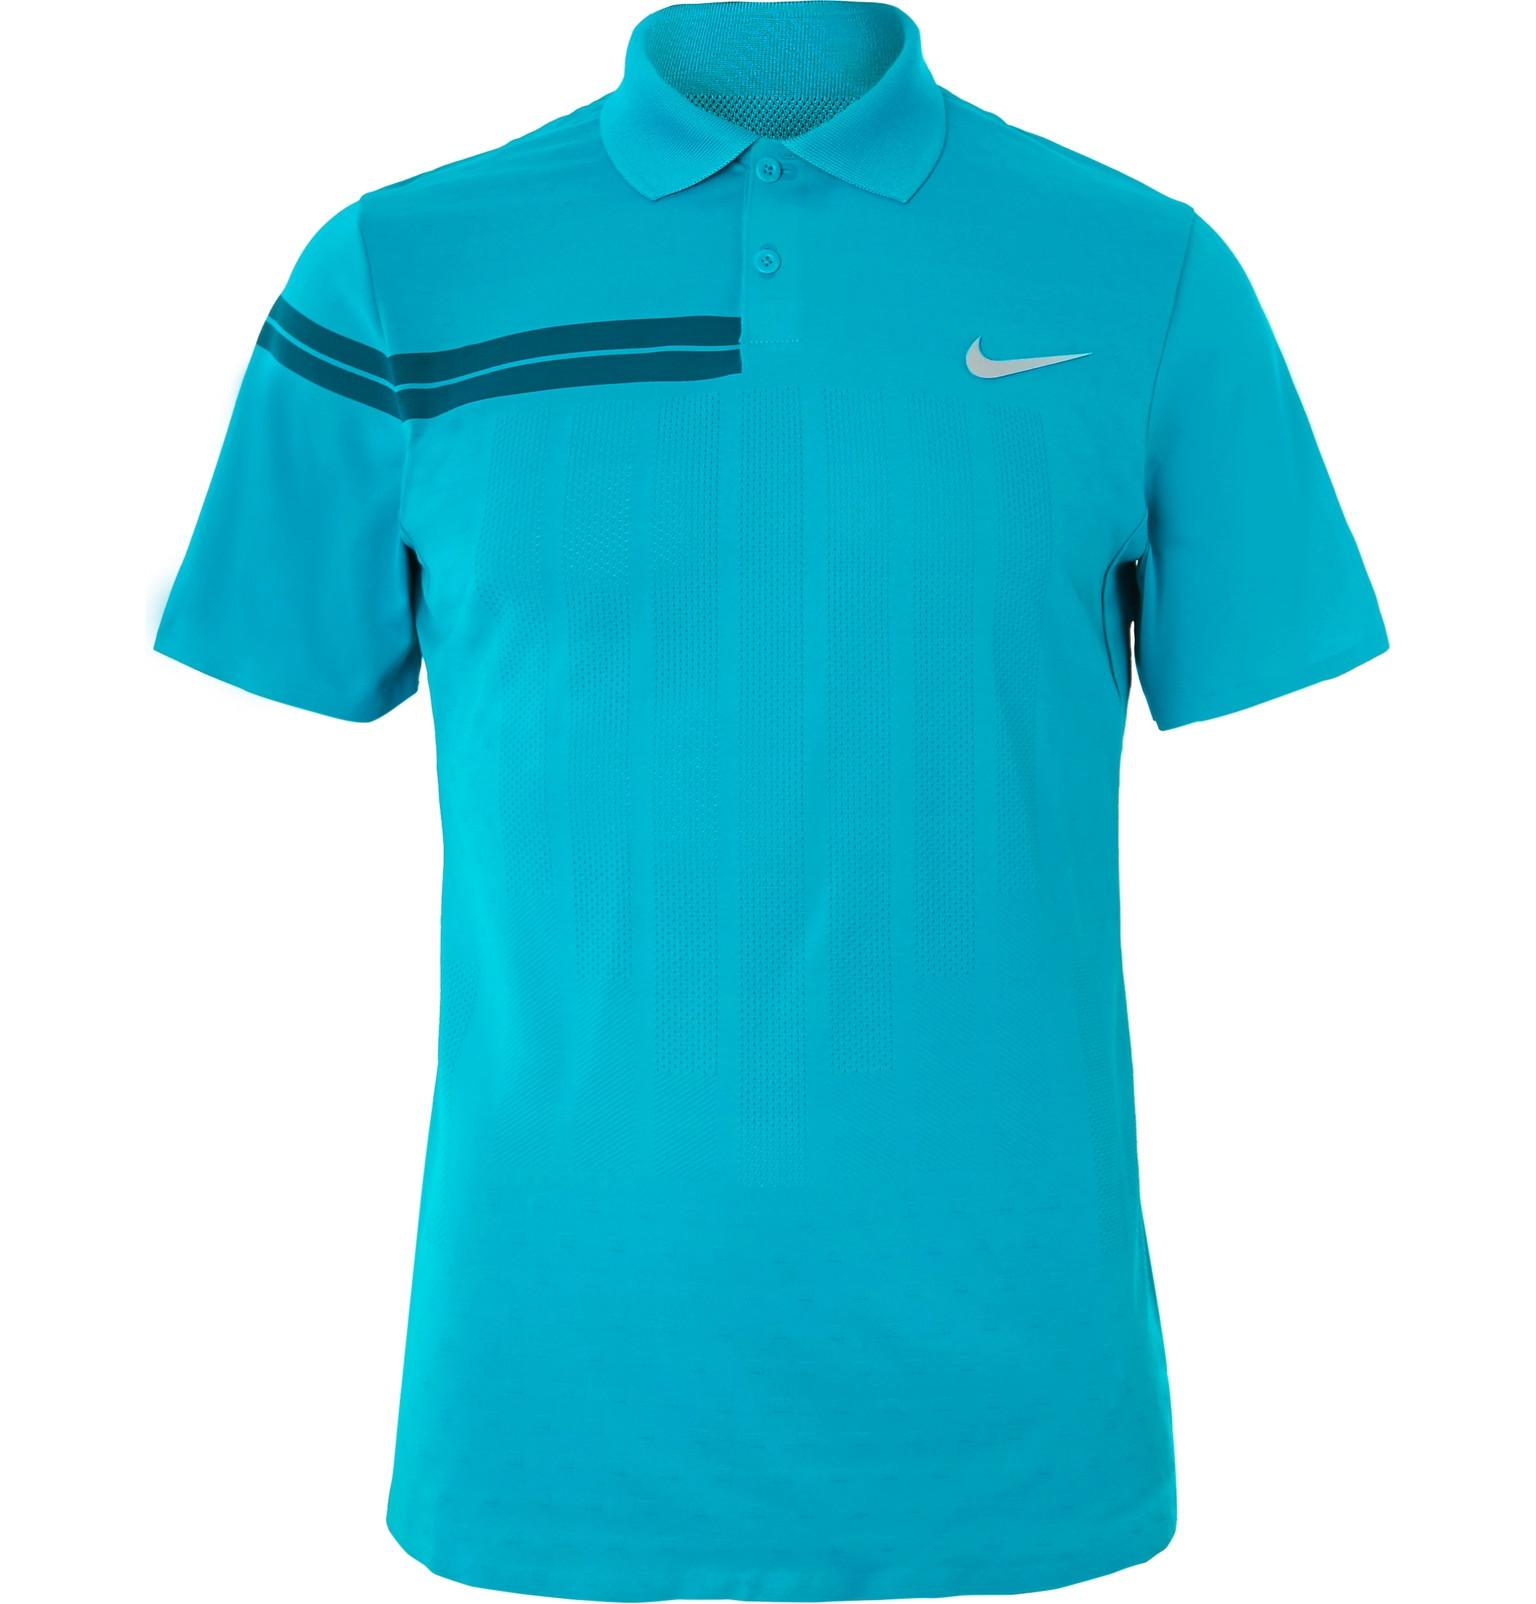 386bb3895e4c8 Nike. Men s Blue Nikecourt Zonal Cooling Roger Federer Advantage Dri-fit  Tennis Polo Shirt